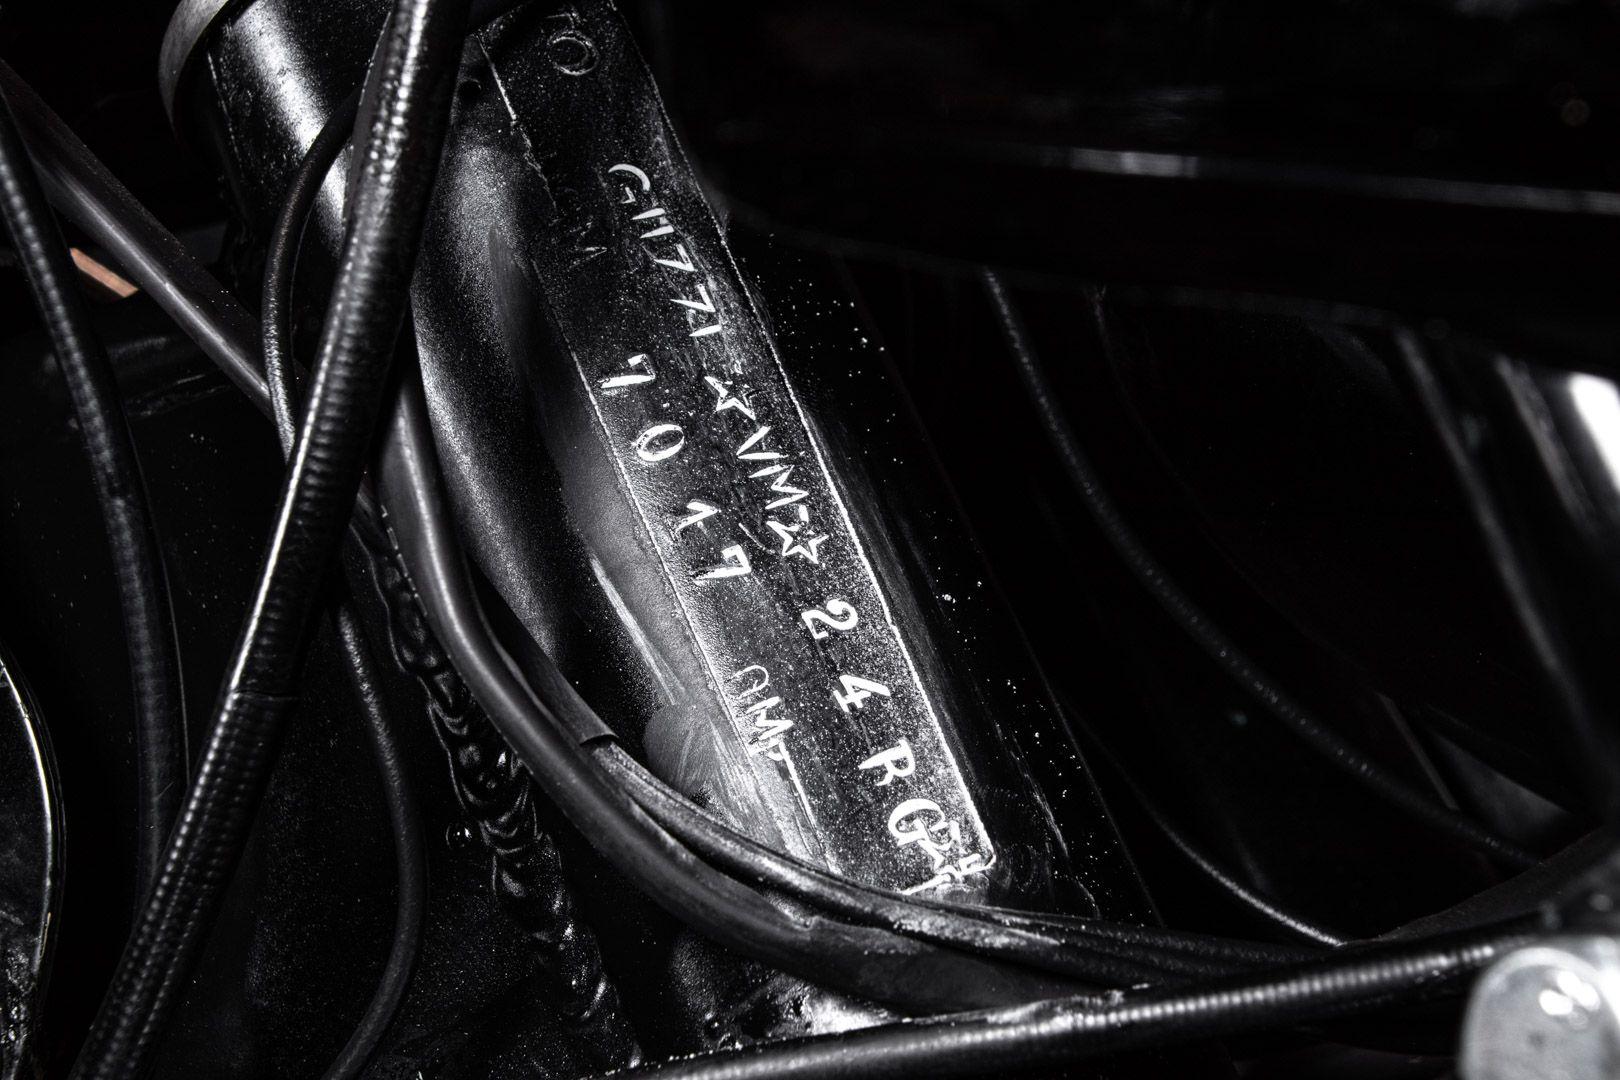 1969 Moto Guzzi V7 Special 81500